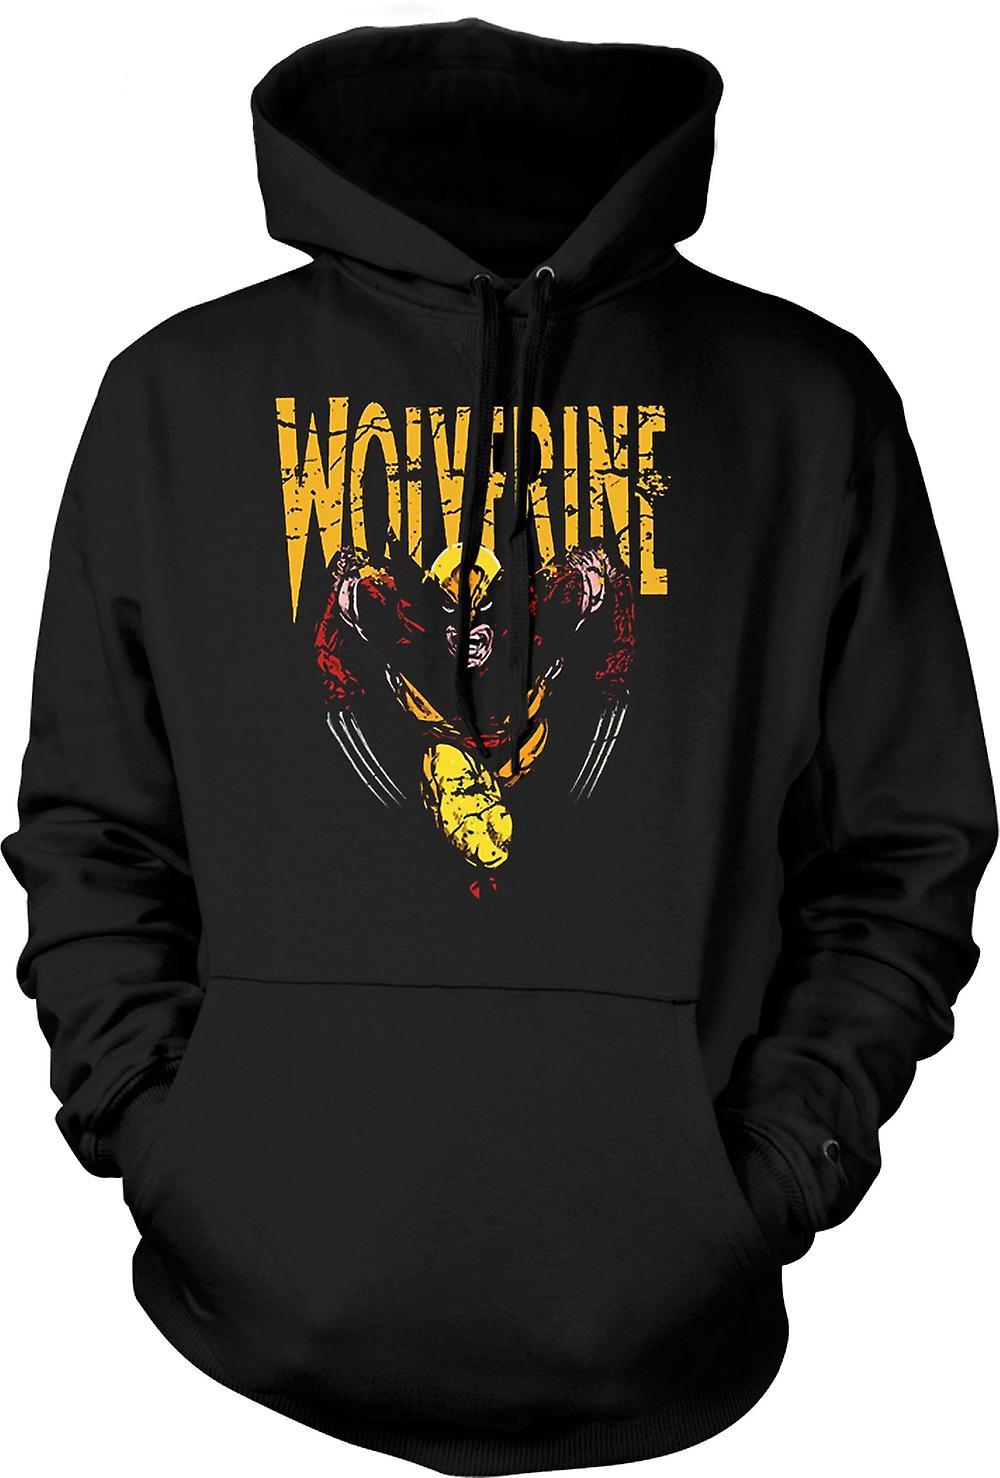 Mens Hoodie - Wolverine - Classic Comic Hero